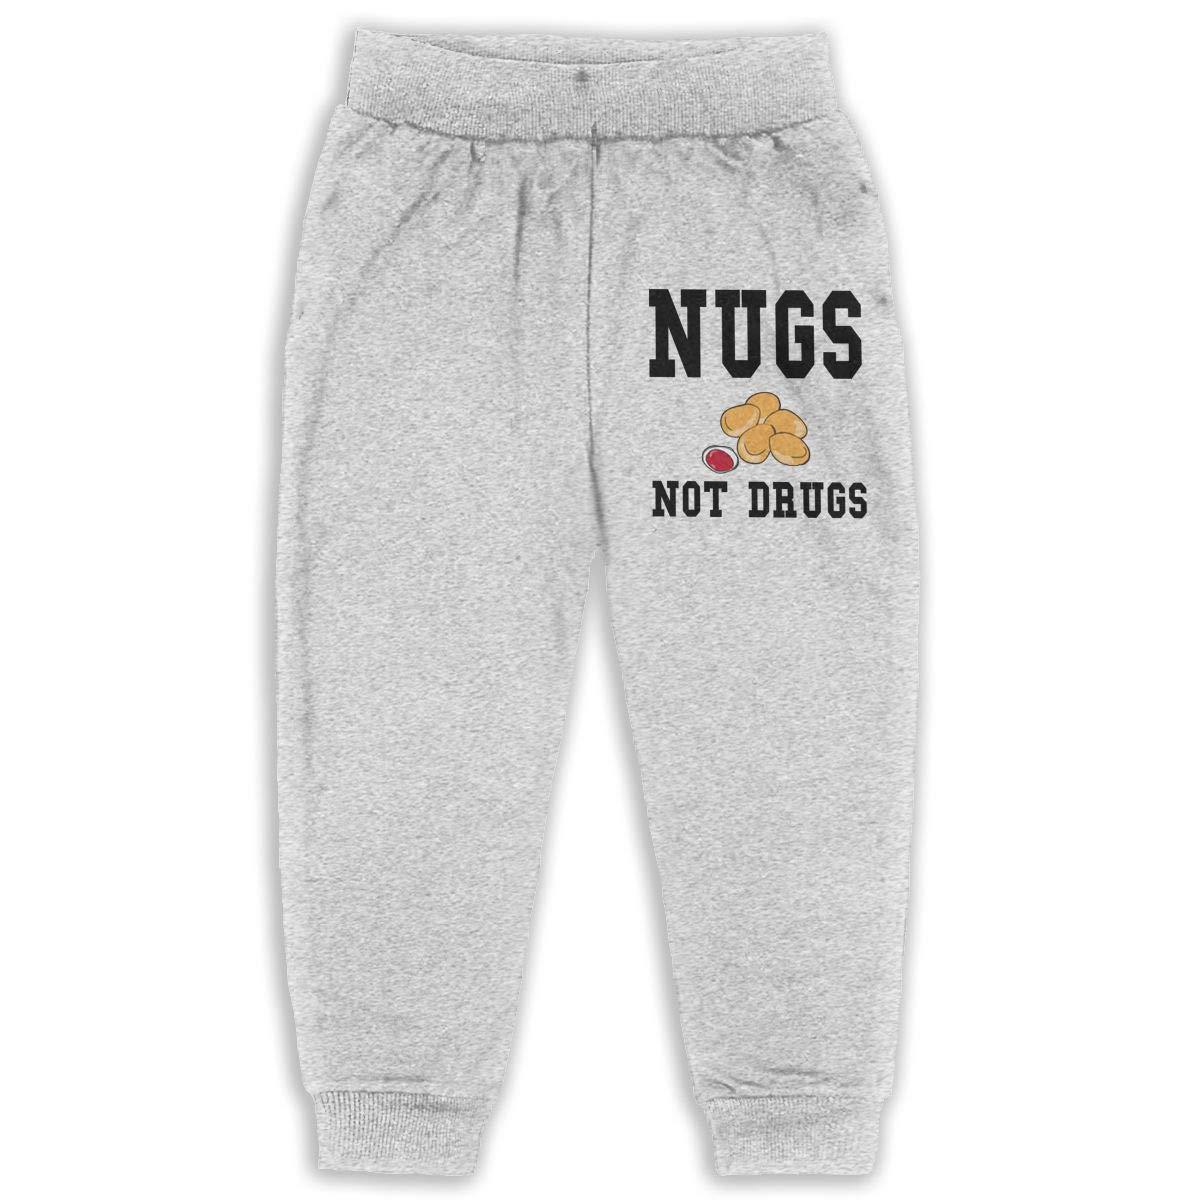 2-6 Years Age 2T-6T JAWANNA Nugs Not Drugs Boys Cotton Sweatpants Gray